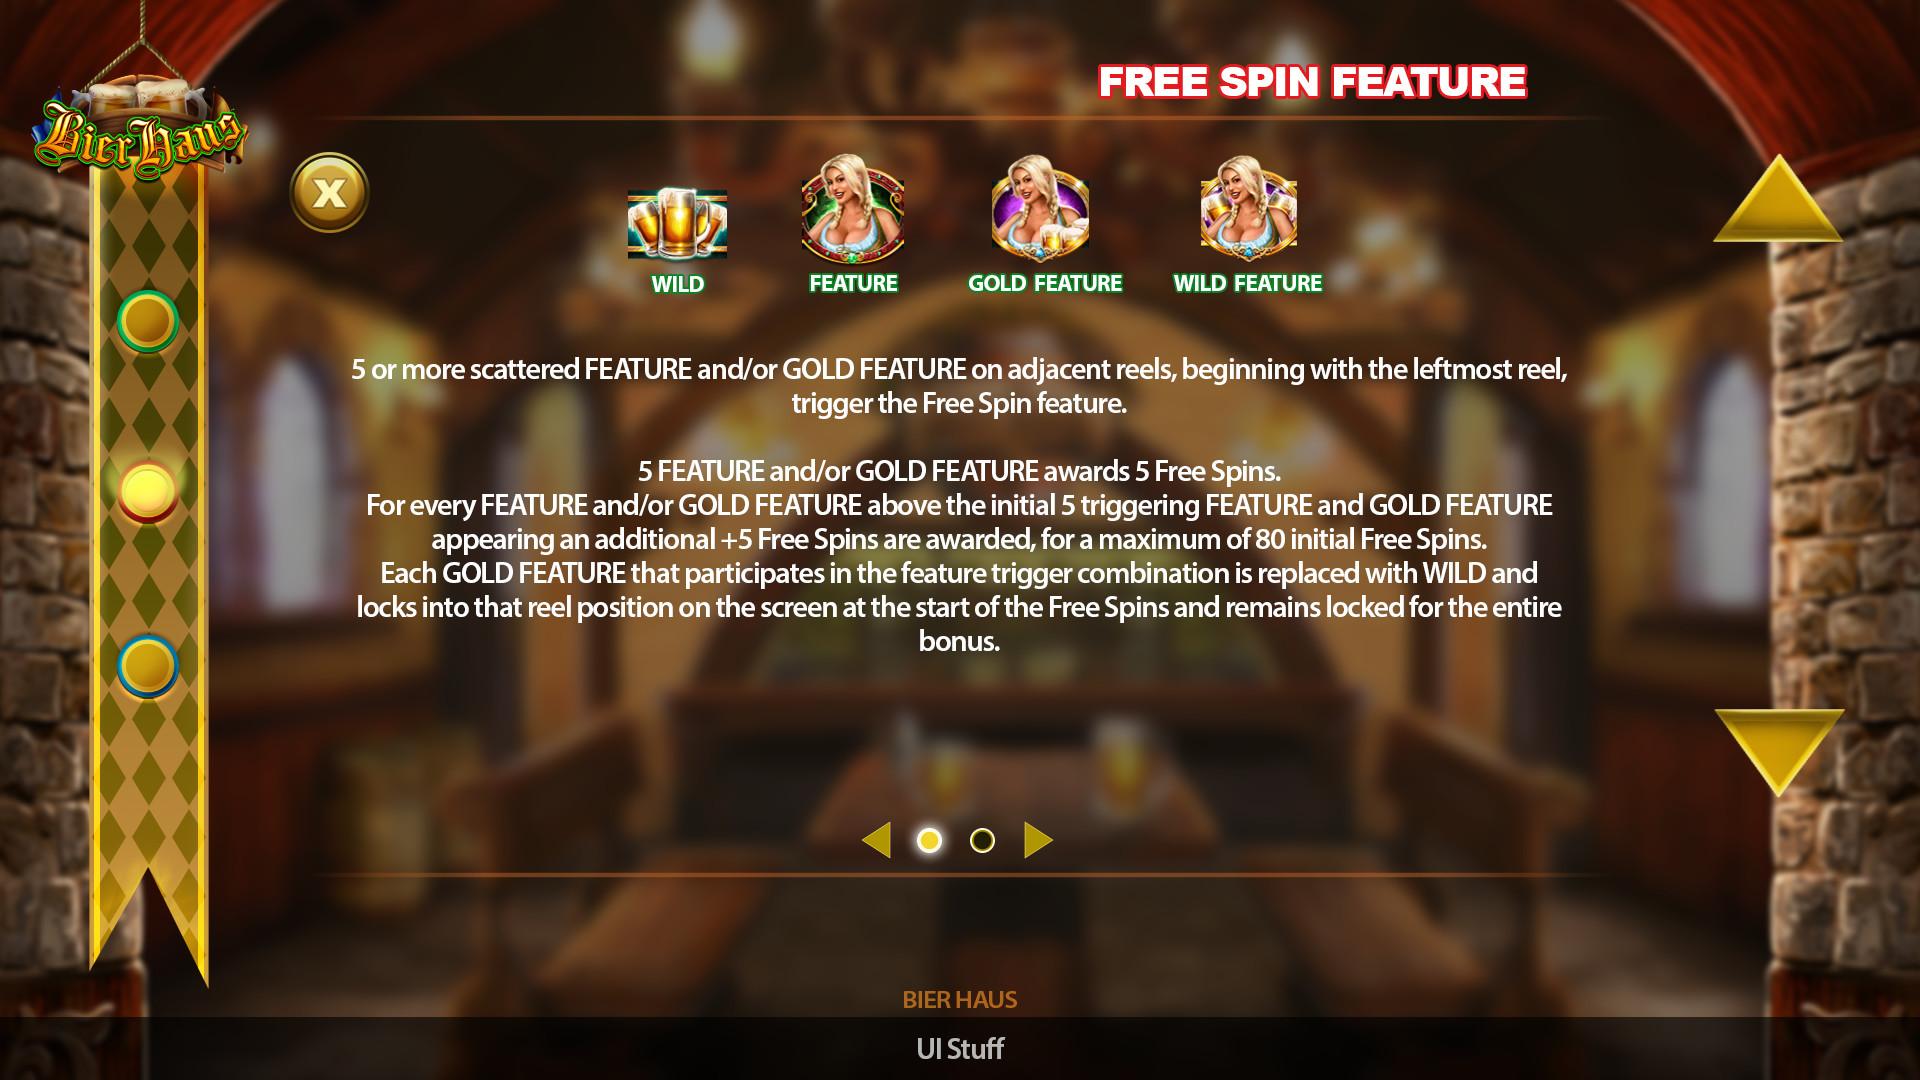 Maria tartaglia hp free spin feature page 4